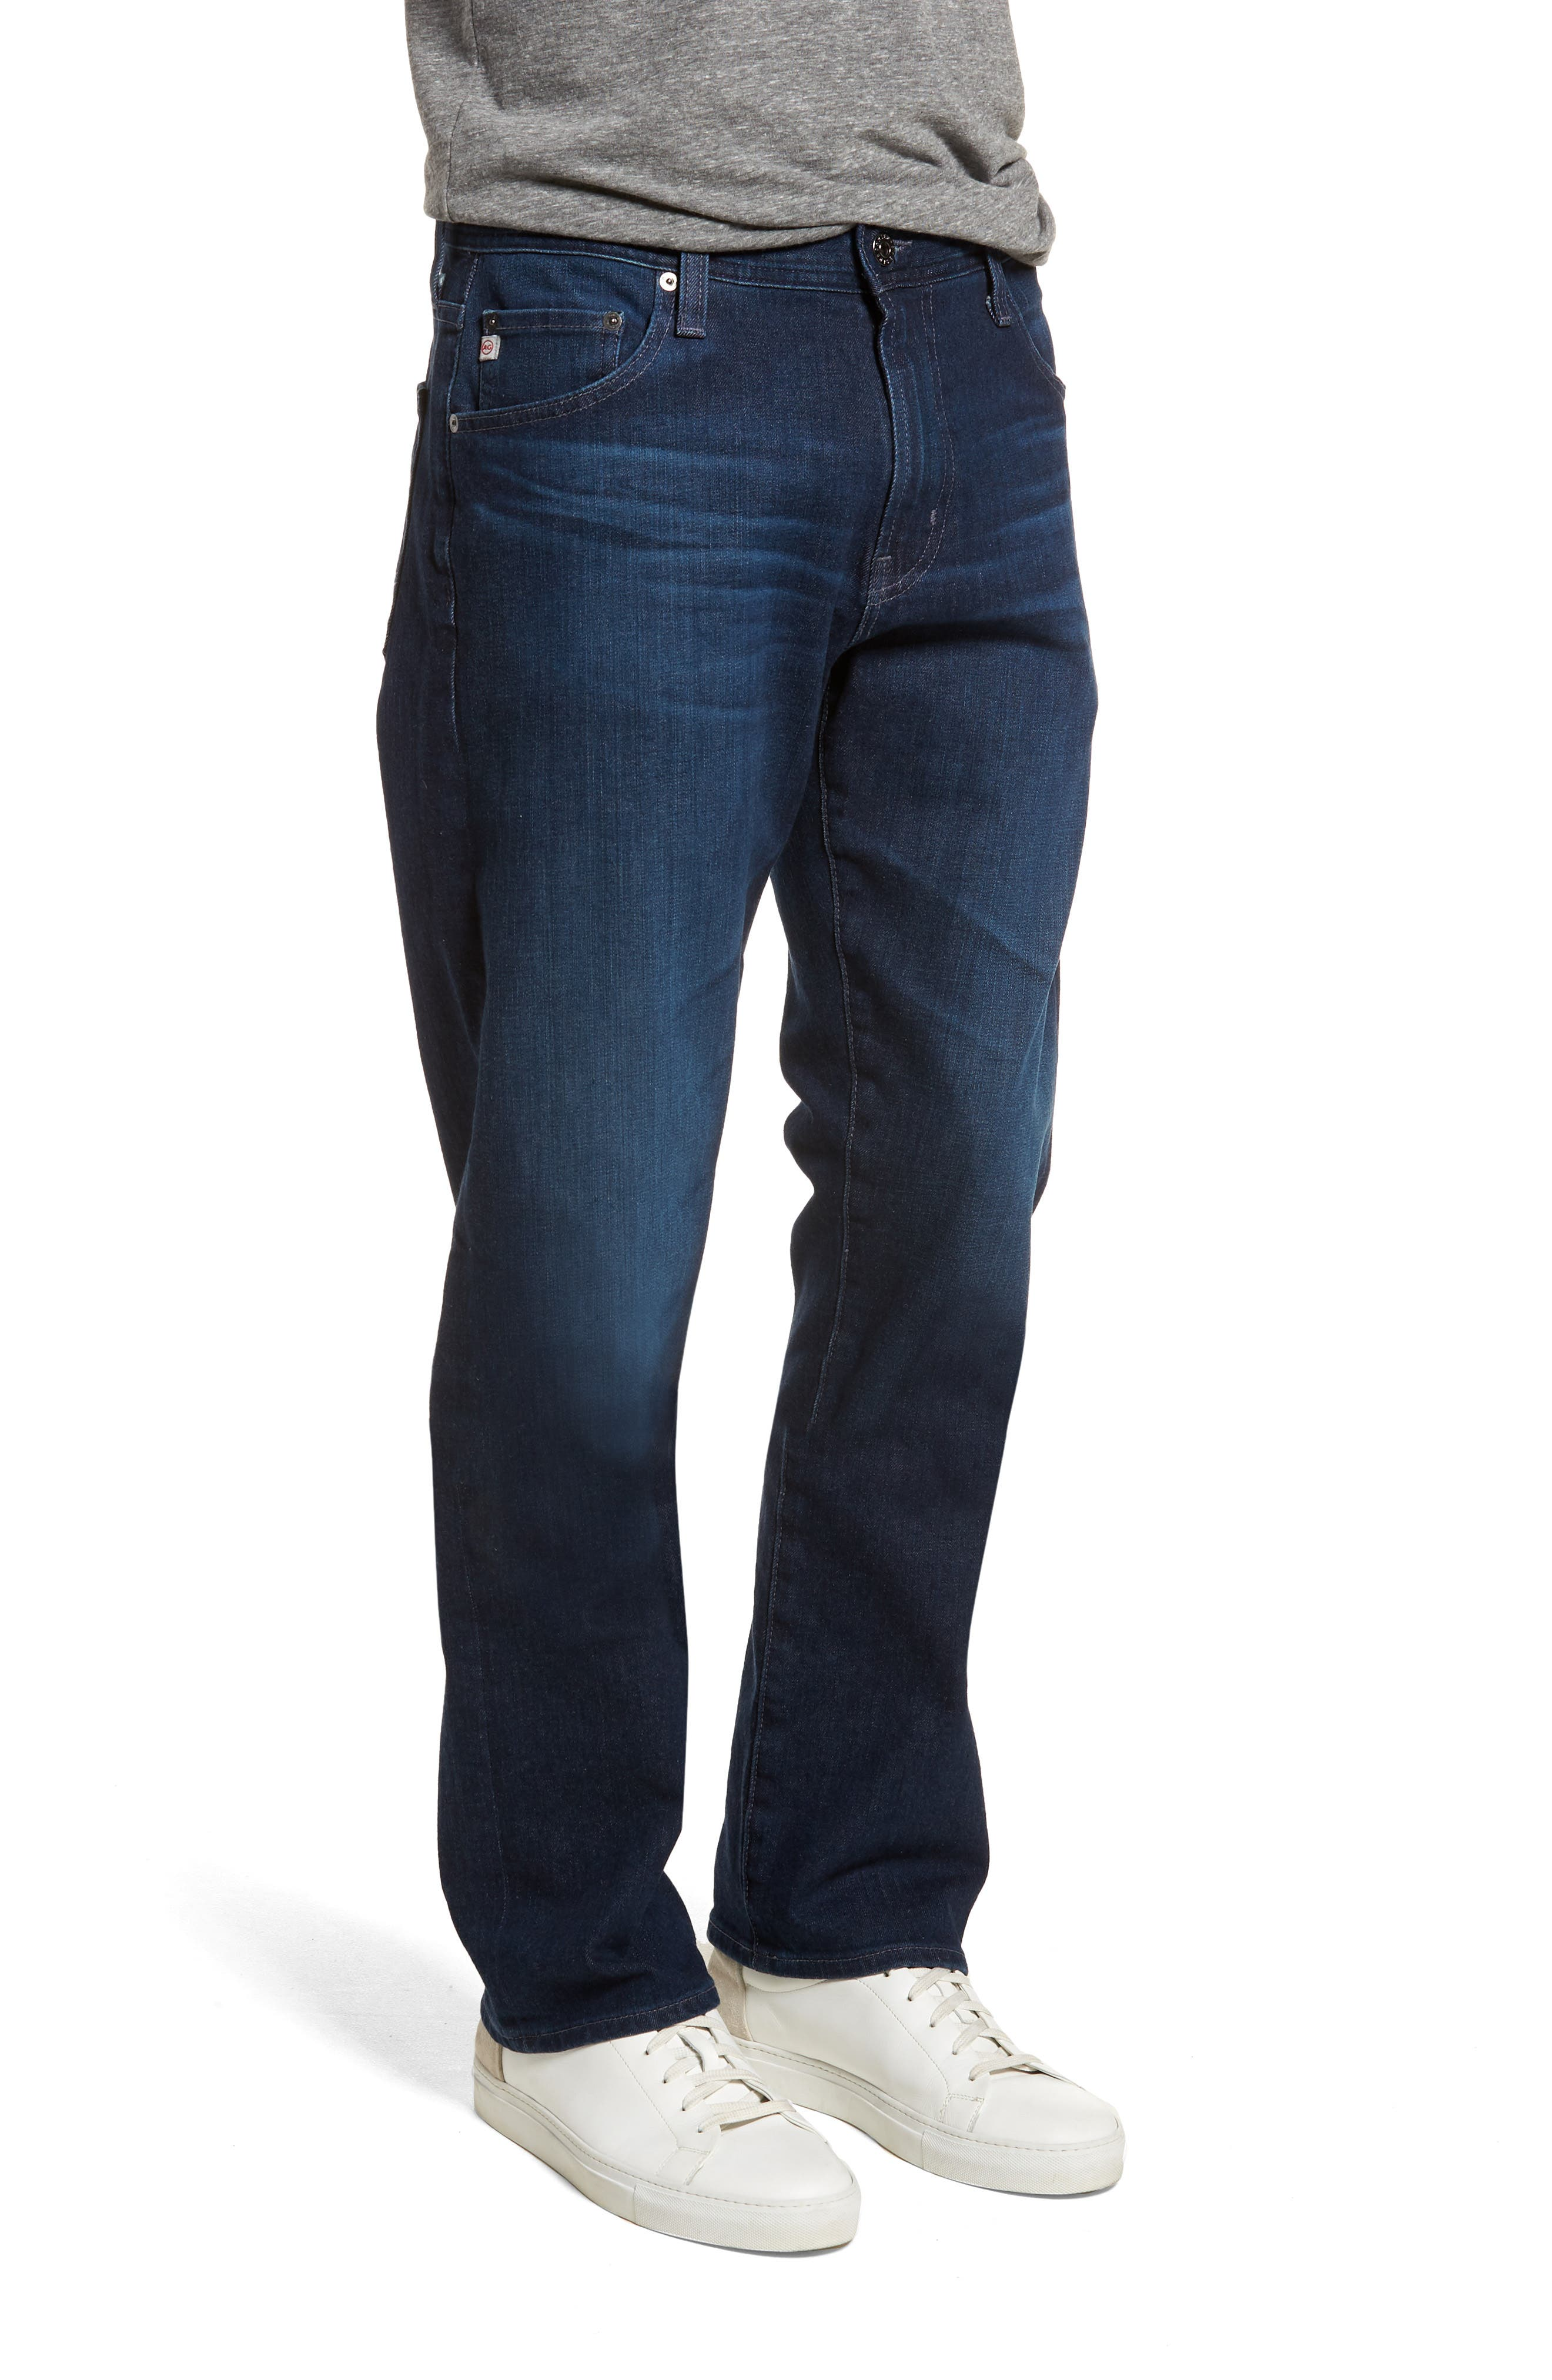 Ives Straight Leg Jeans,                             Alternate thumbnail 3, color,                             407